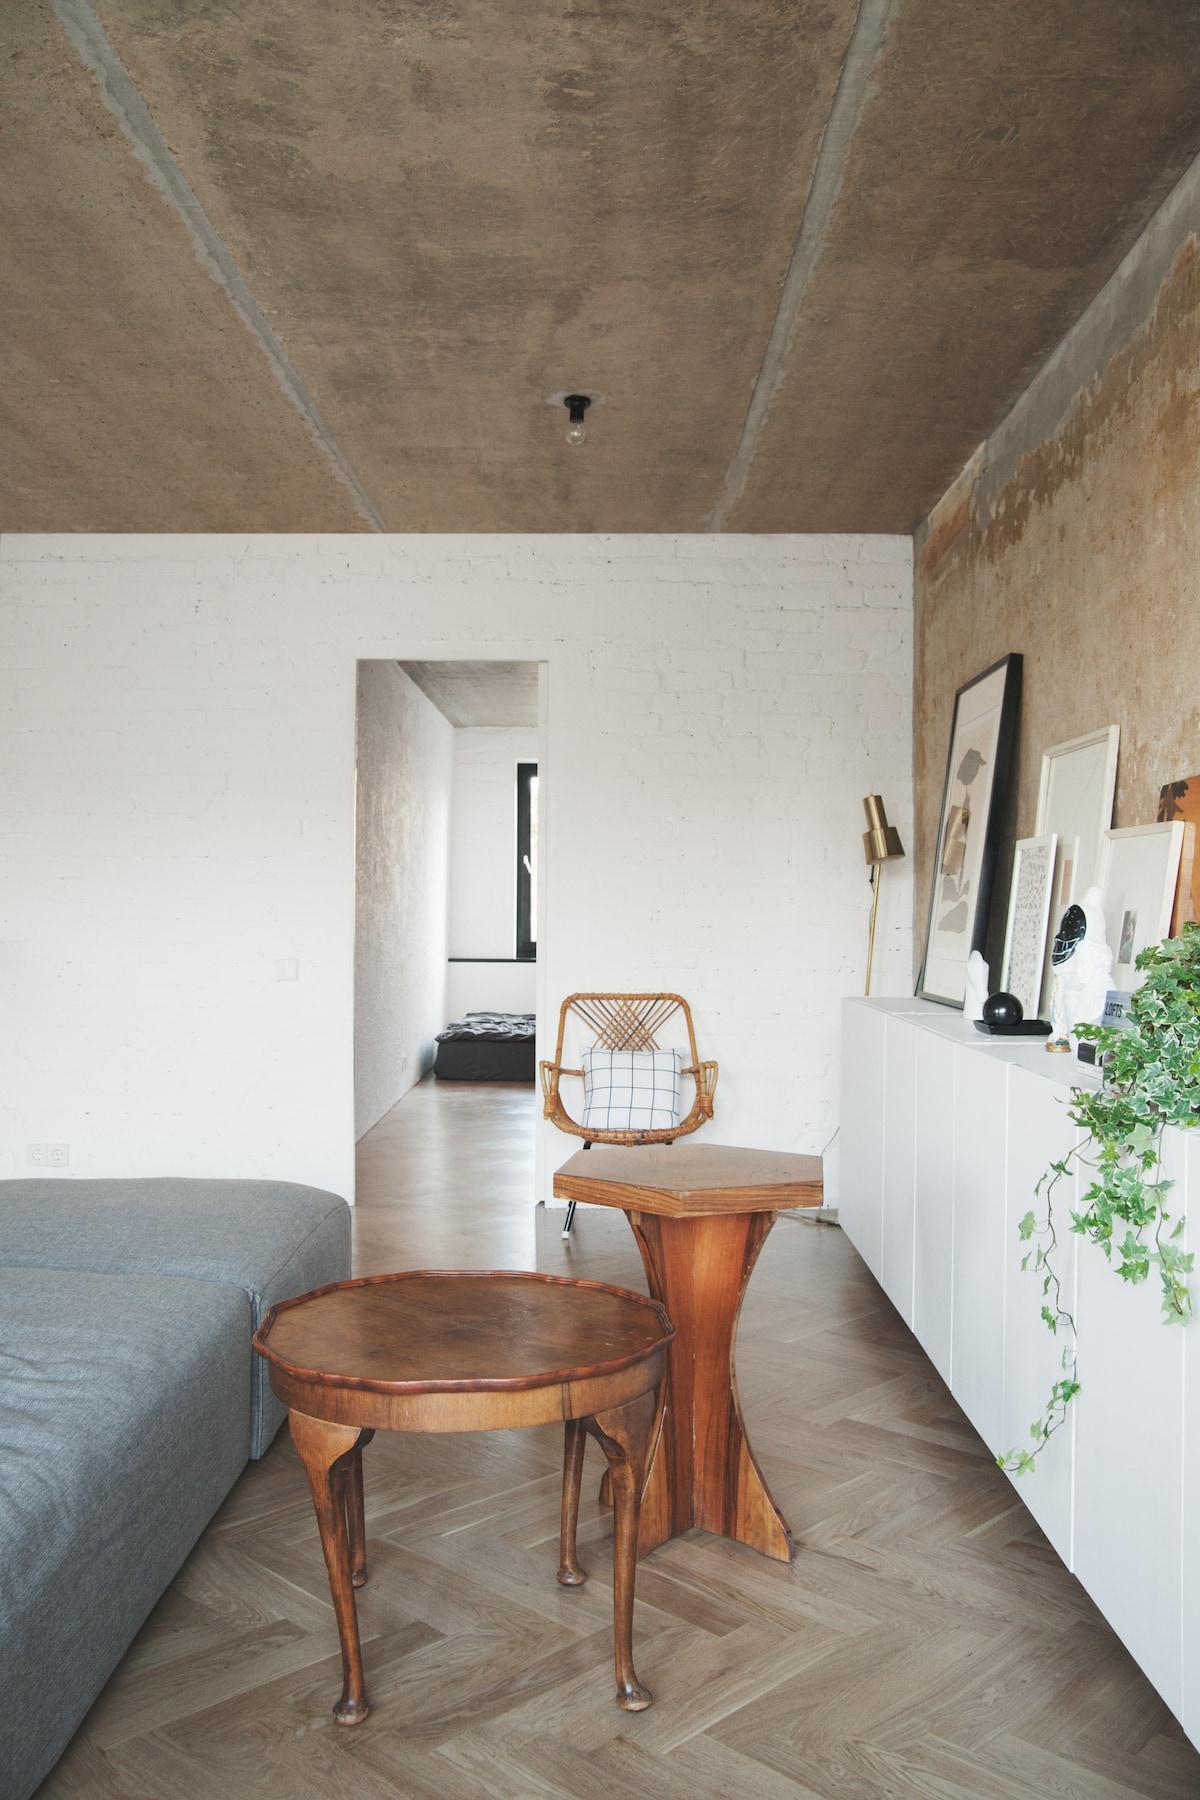 kitchen calculator cart island concrete ceiling apartment | leibal